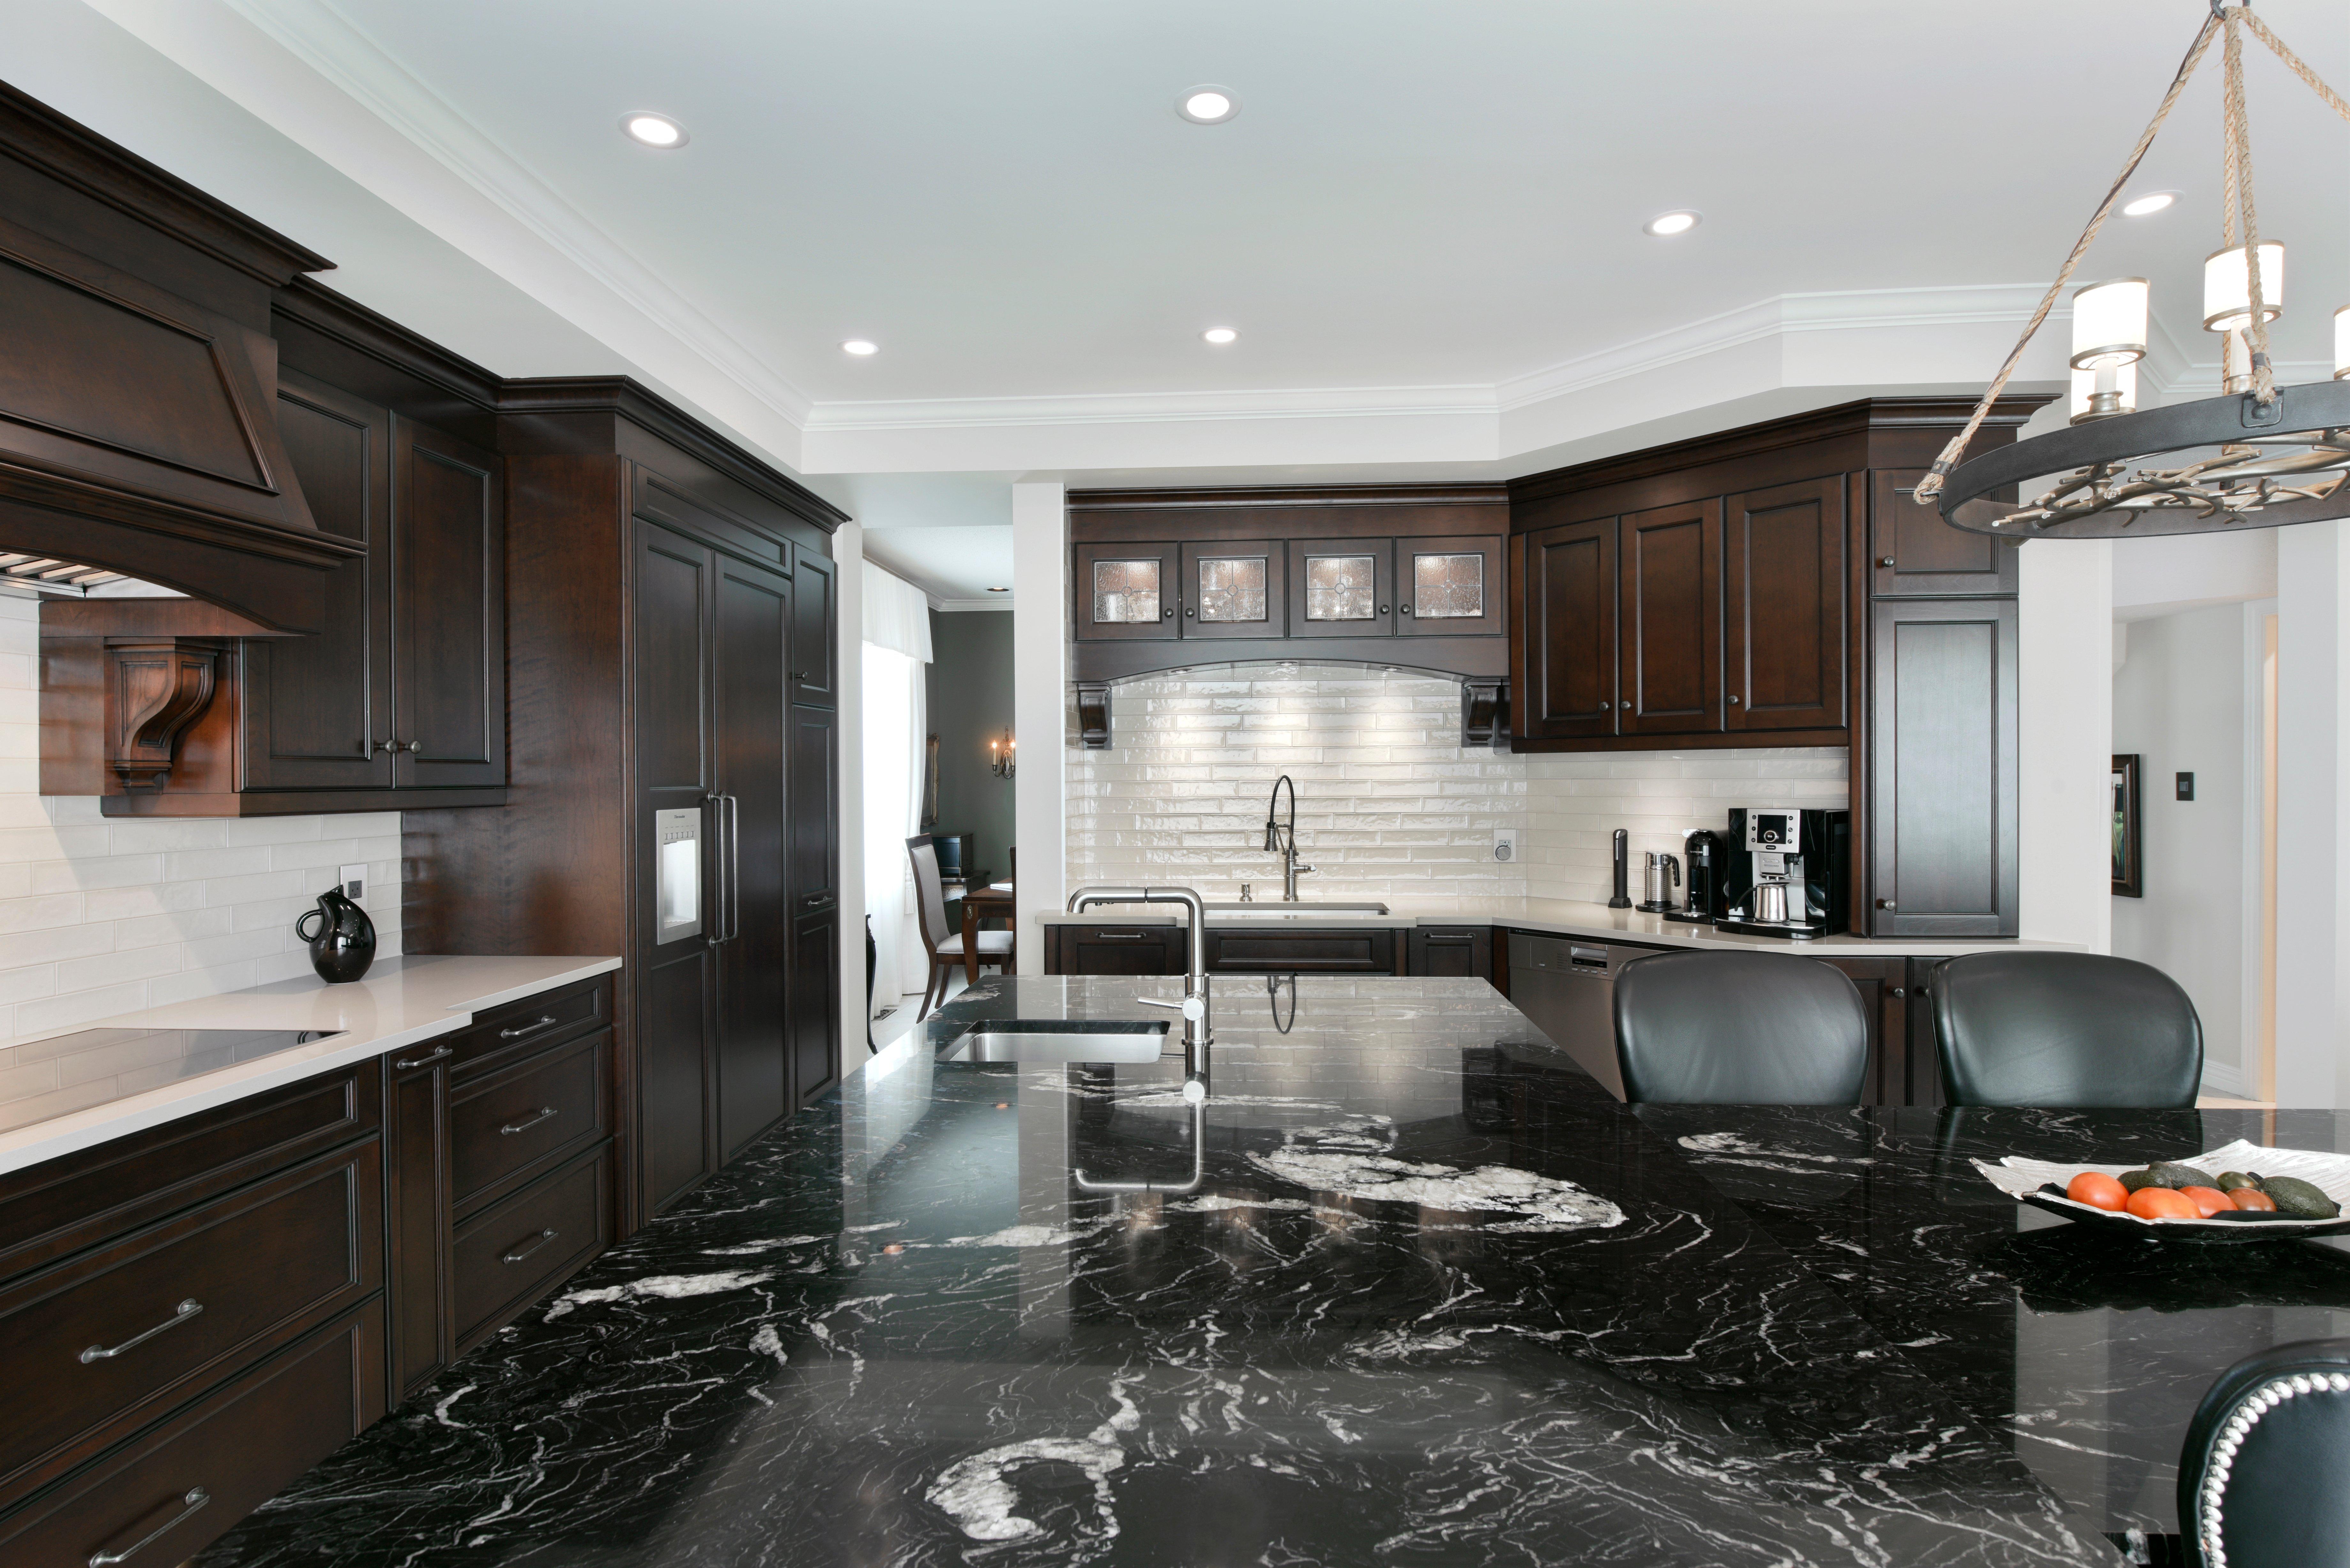 A luxurious granite countertop